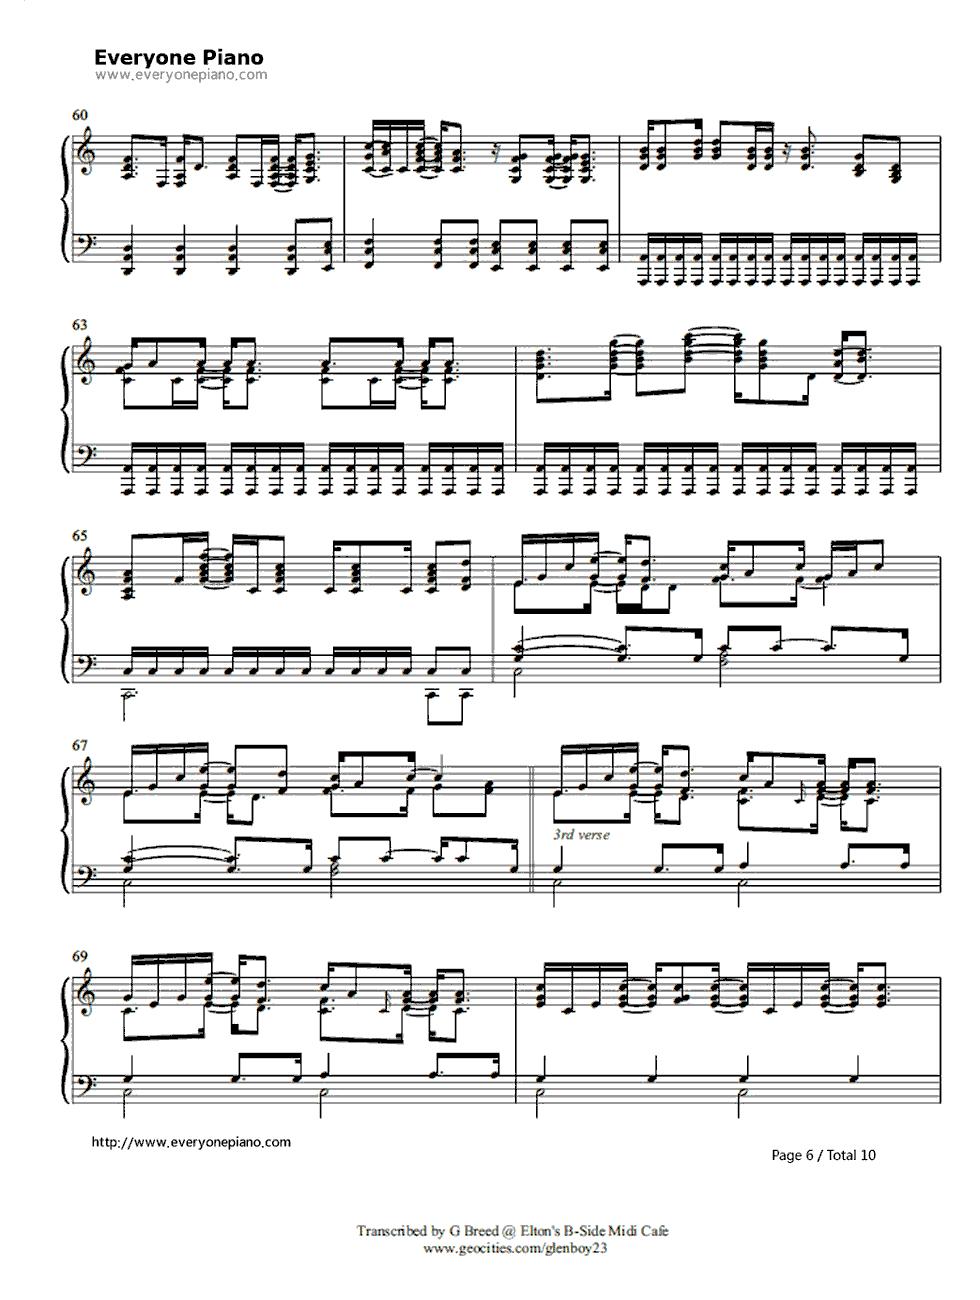 Tiny dancer elton john stave preview 6 free piano sheet music listen now print sheet tiny dancer elton john stave preview 6 hexwebz Gallery